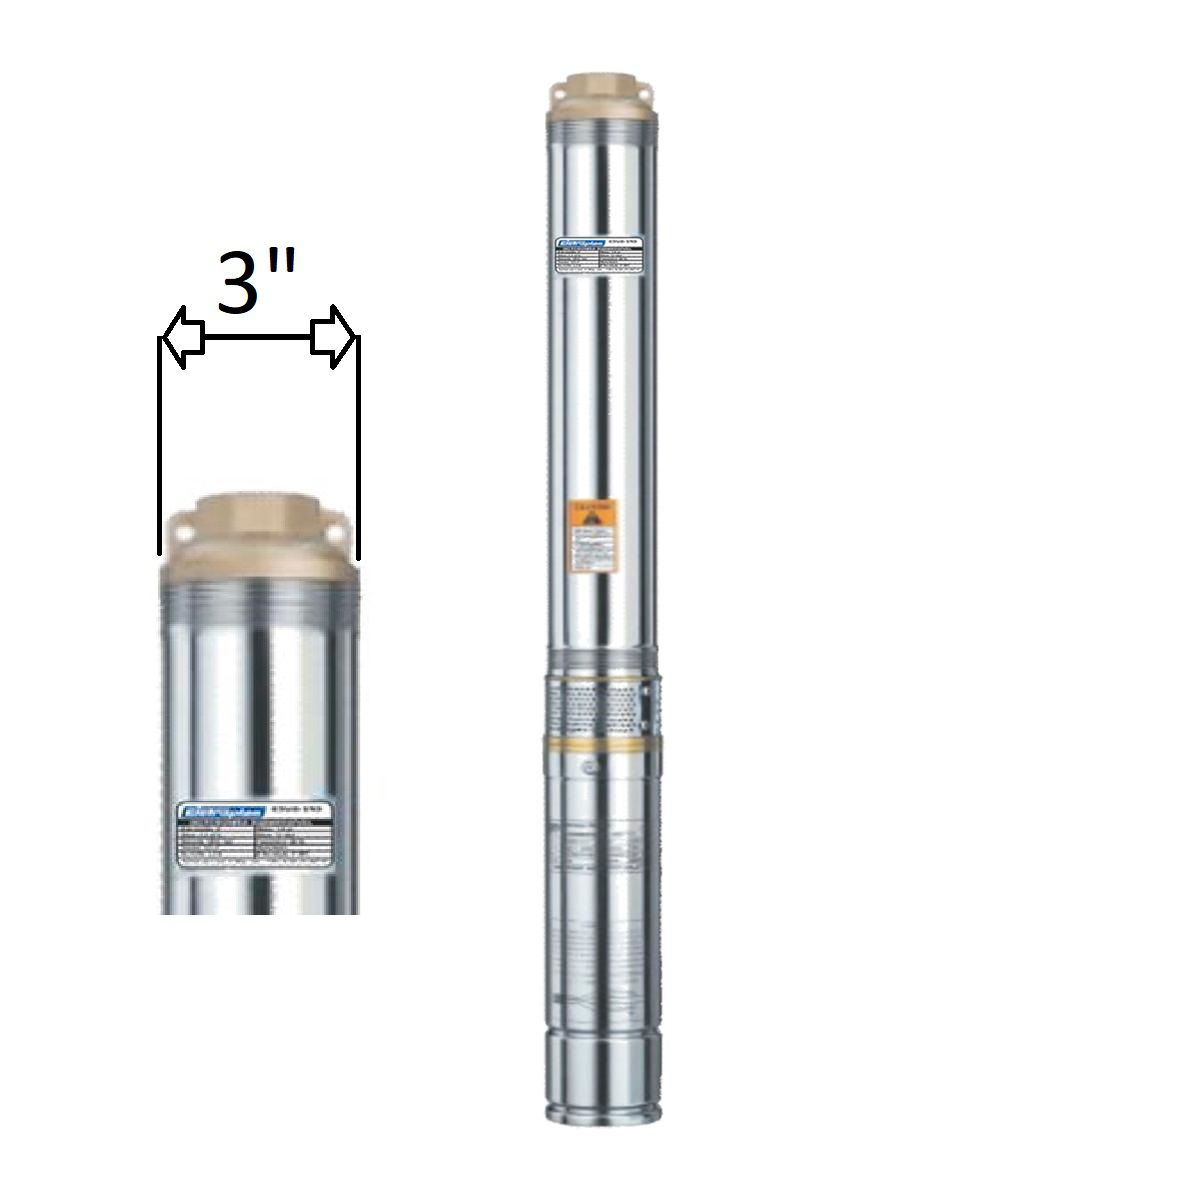 "Motobomba Submersa Caneta 1/3Cv Mono 3"" ESUB-3/6S 220V  Eletroplas"